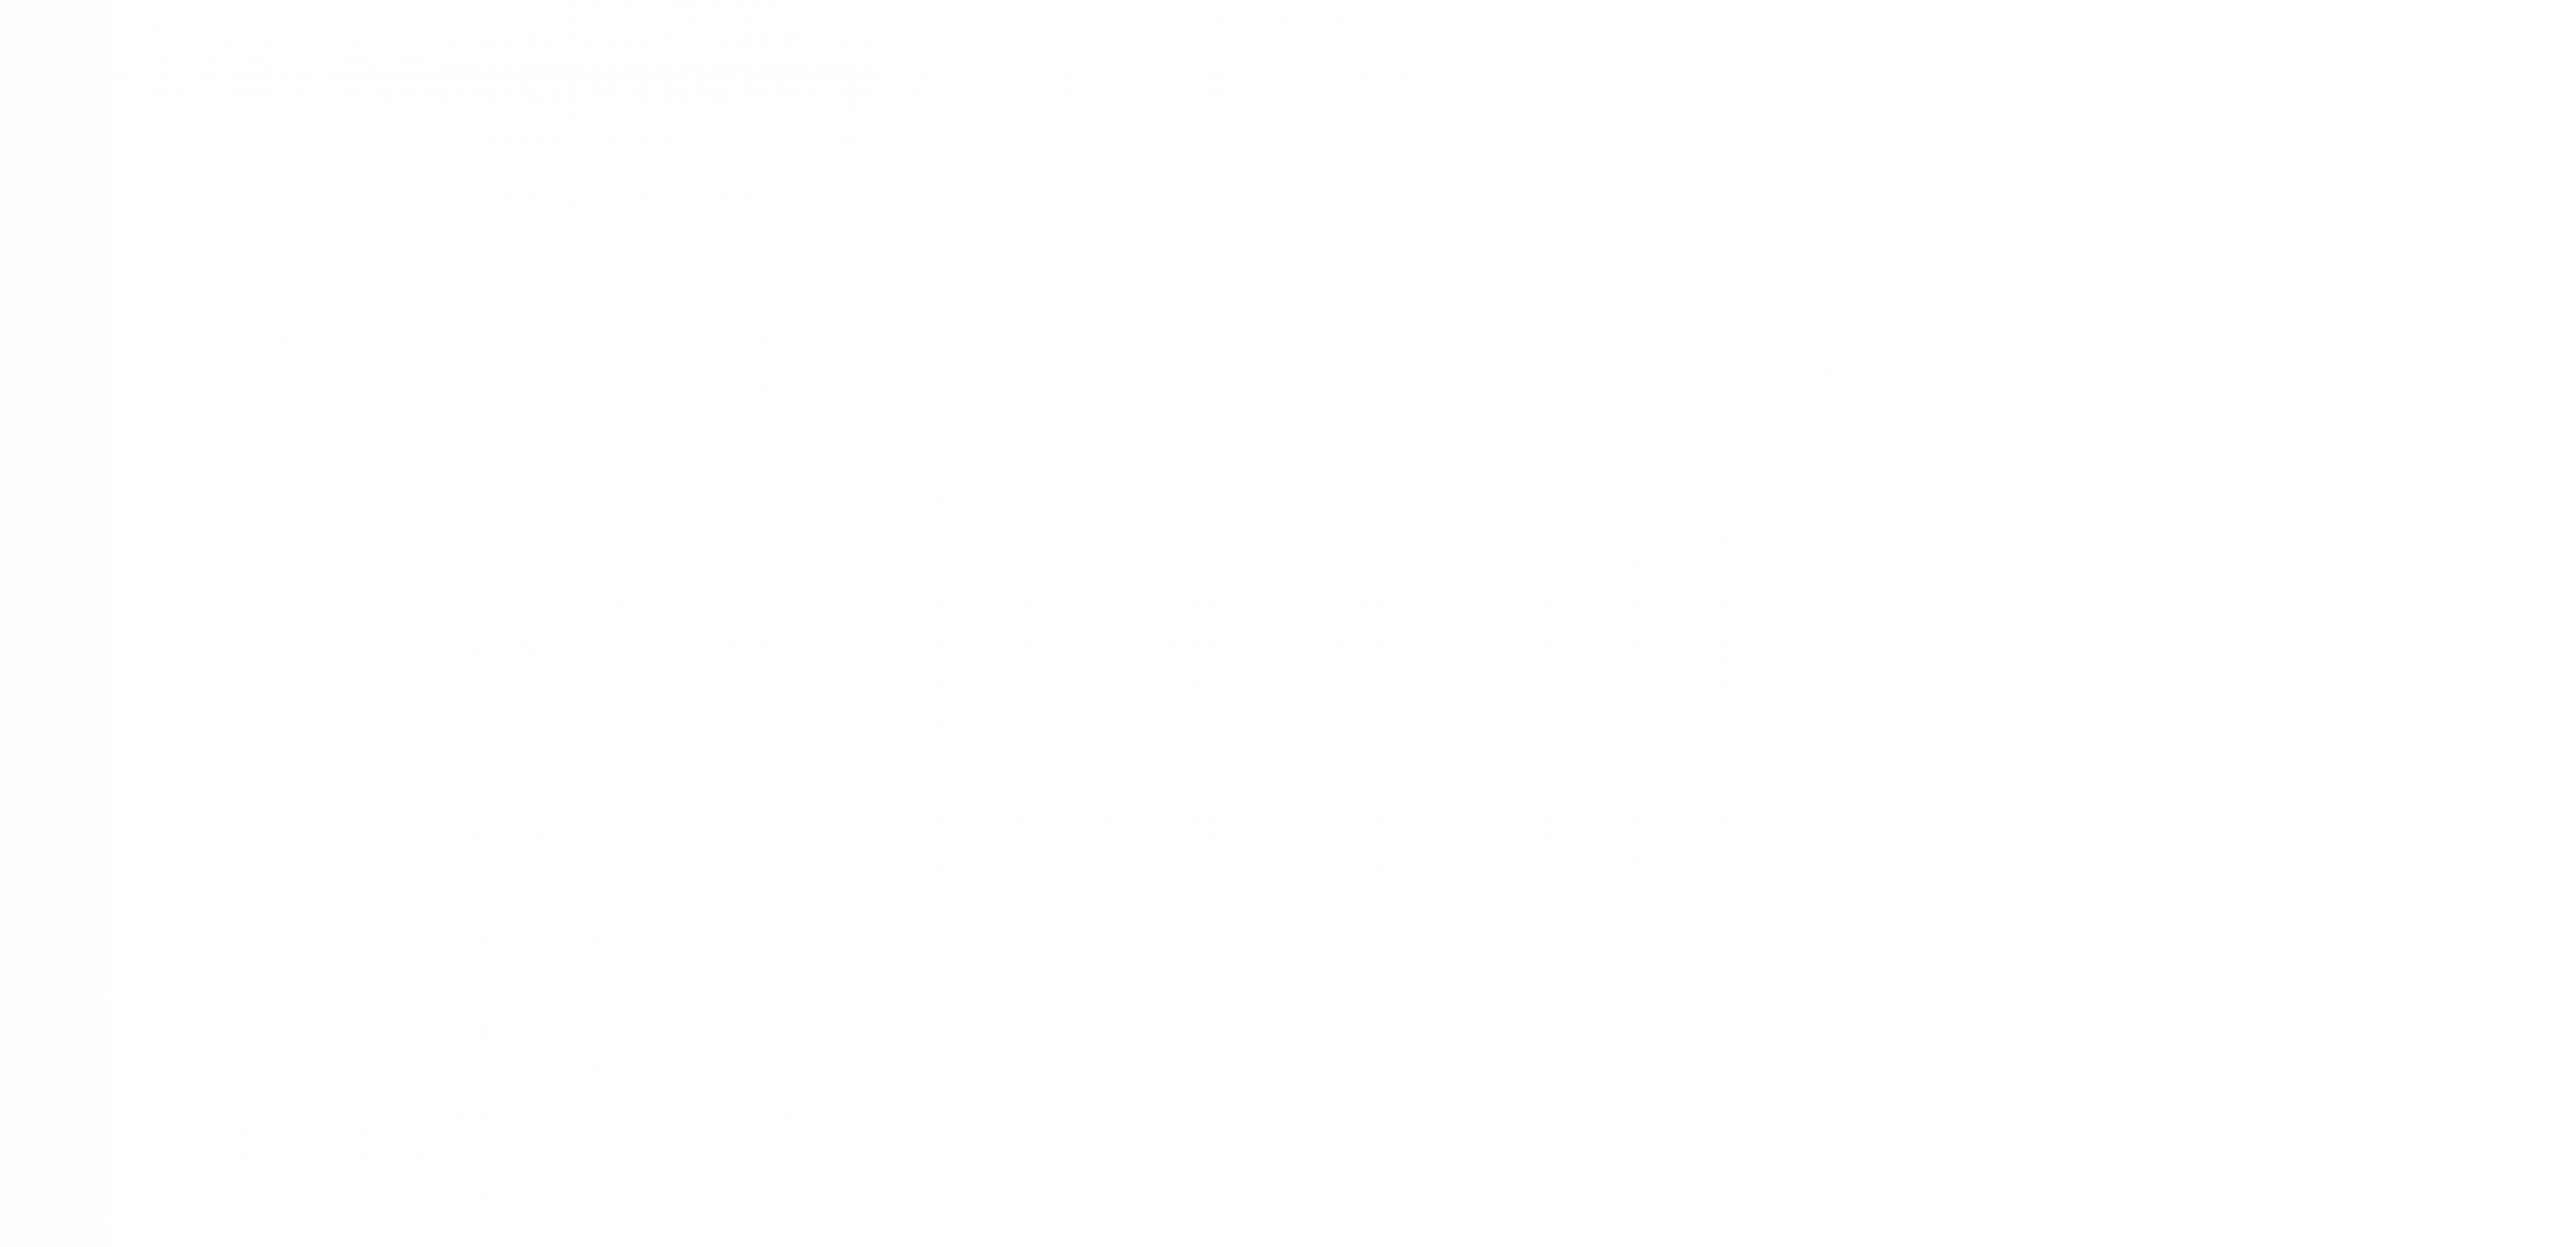 img_1992